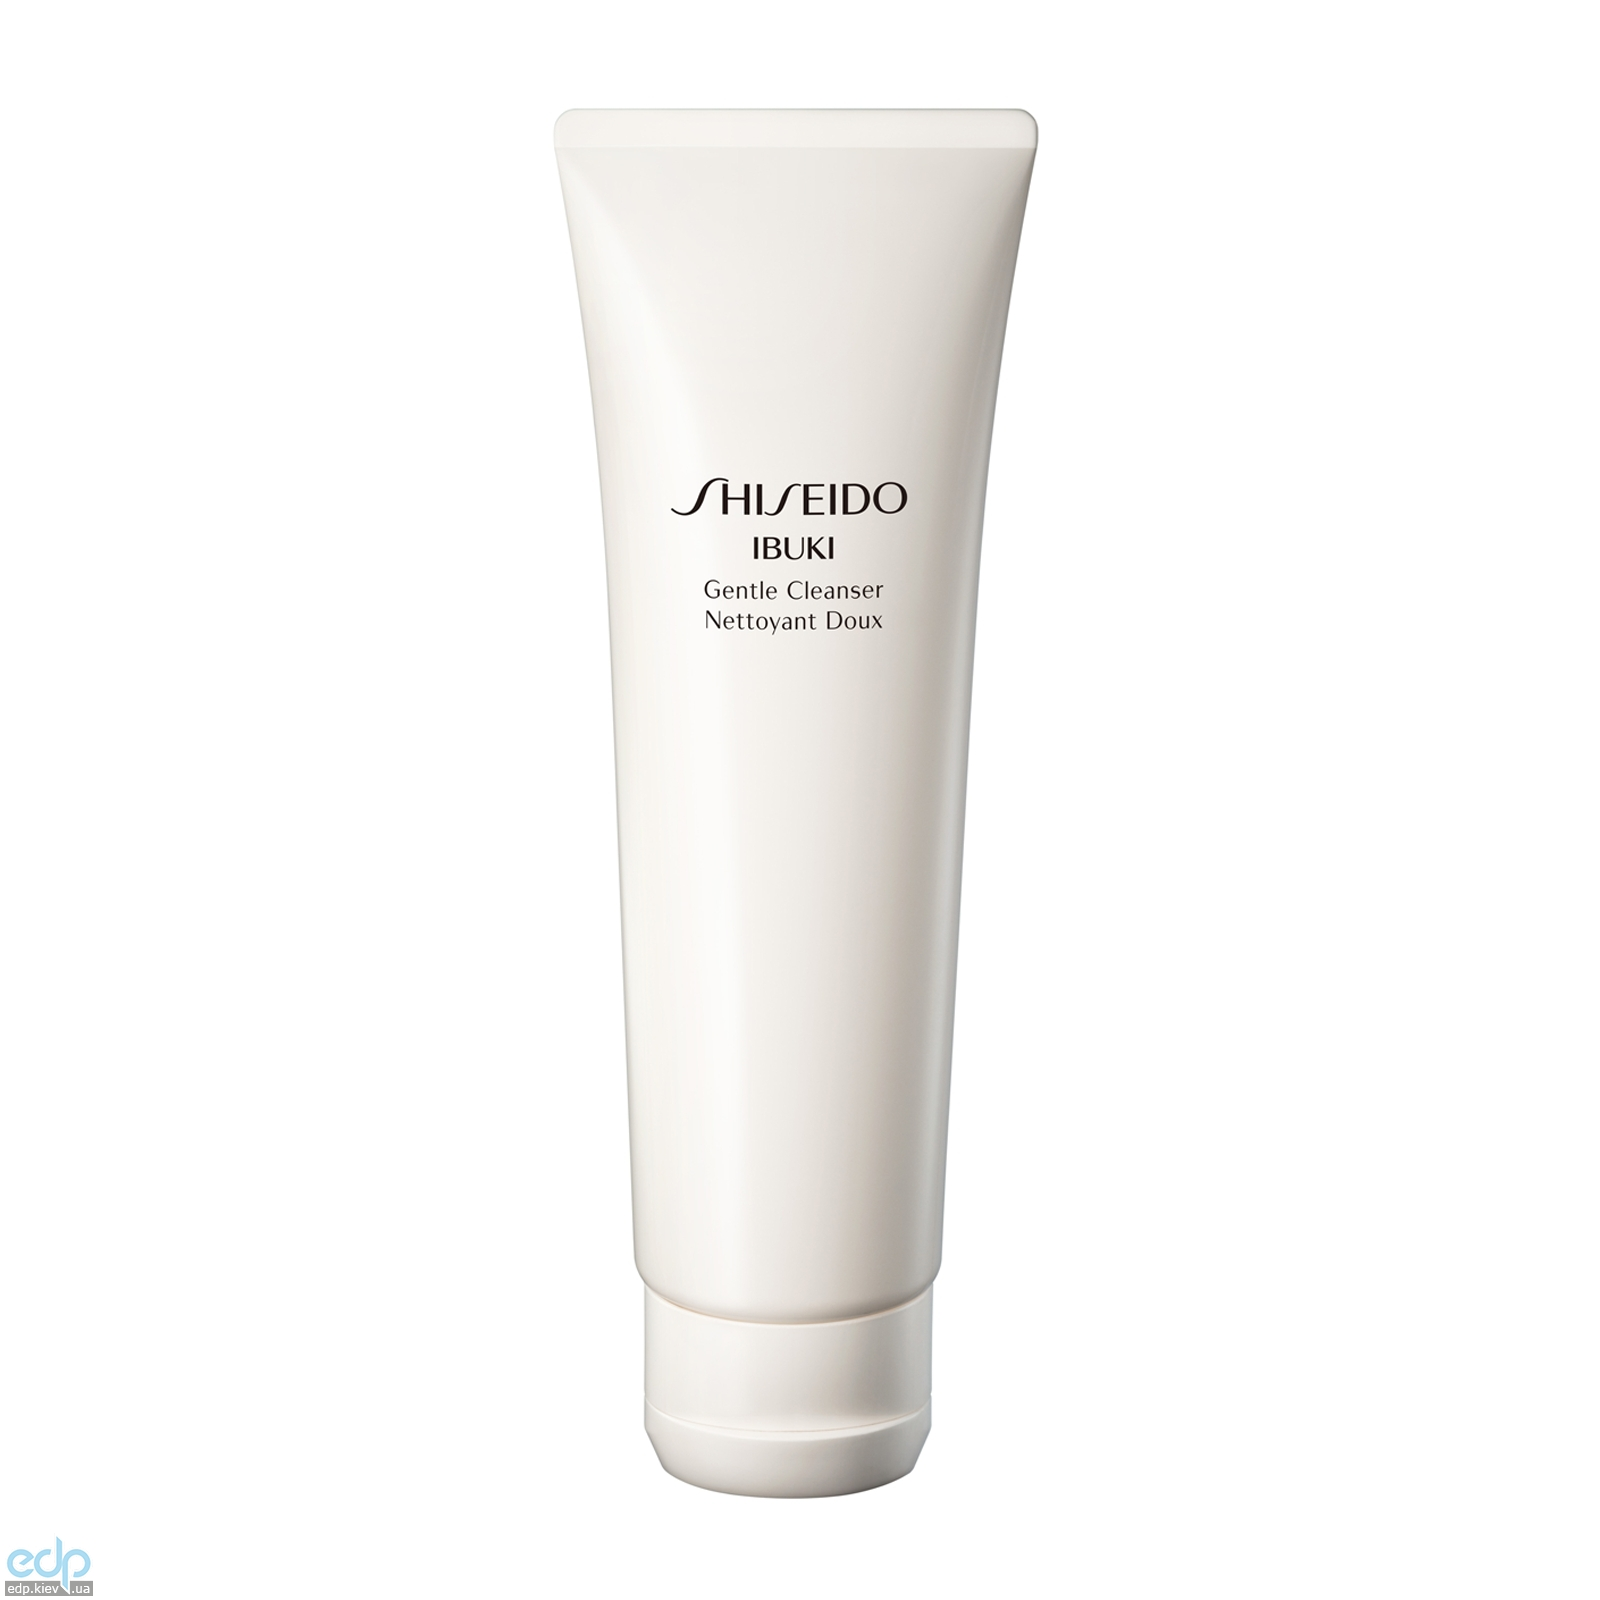 Shiseido -  Мягкая очищающая пенка Shiseido Ibuku Gentle Cleanser - 125 ml